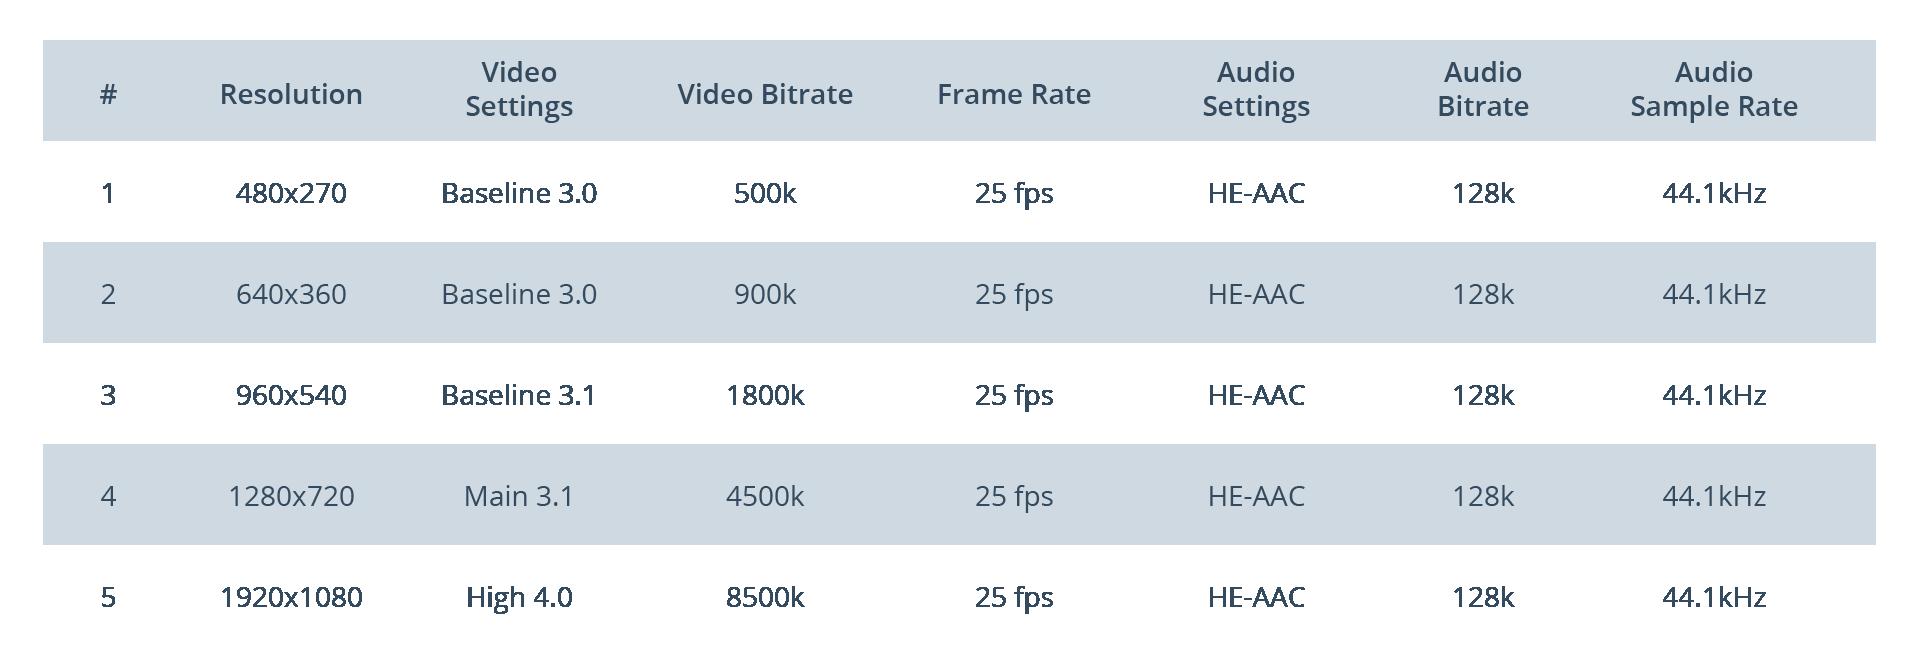 Encoding cost efficient blog visual-02